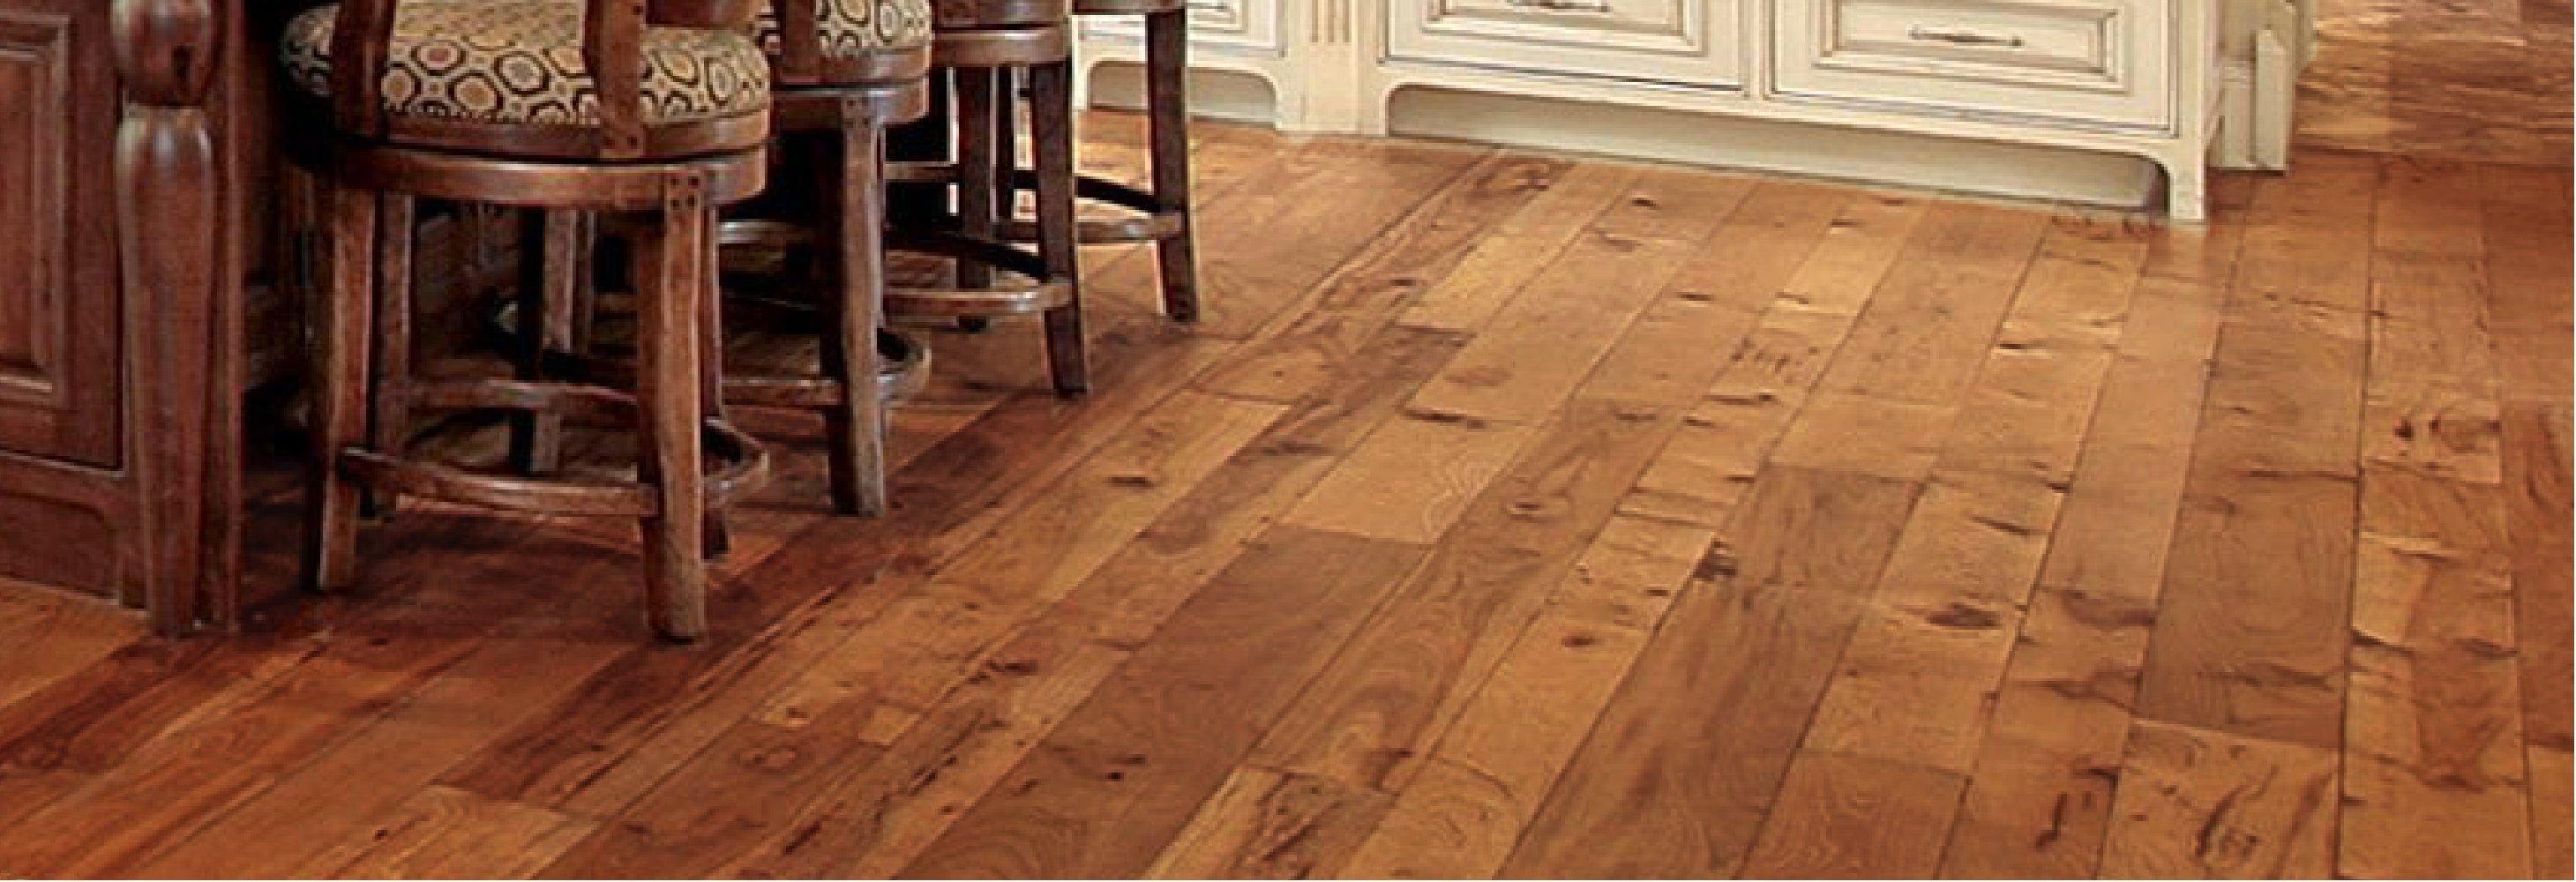 oak hardwood flooring oak wood flooring EFHDTPU